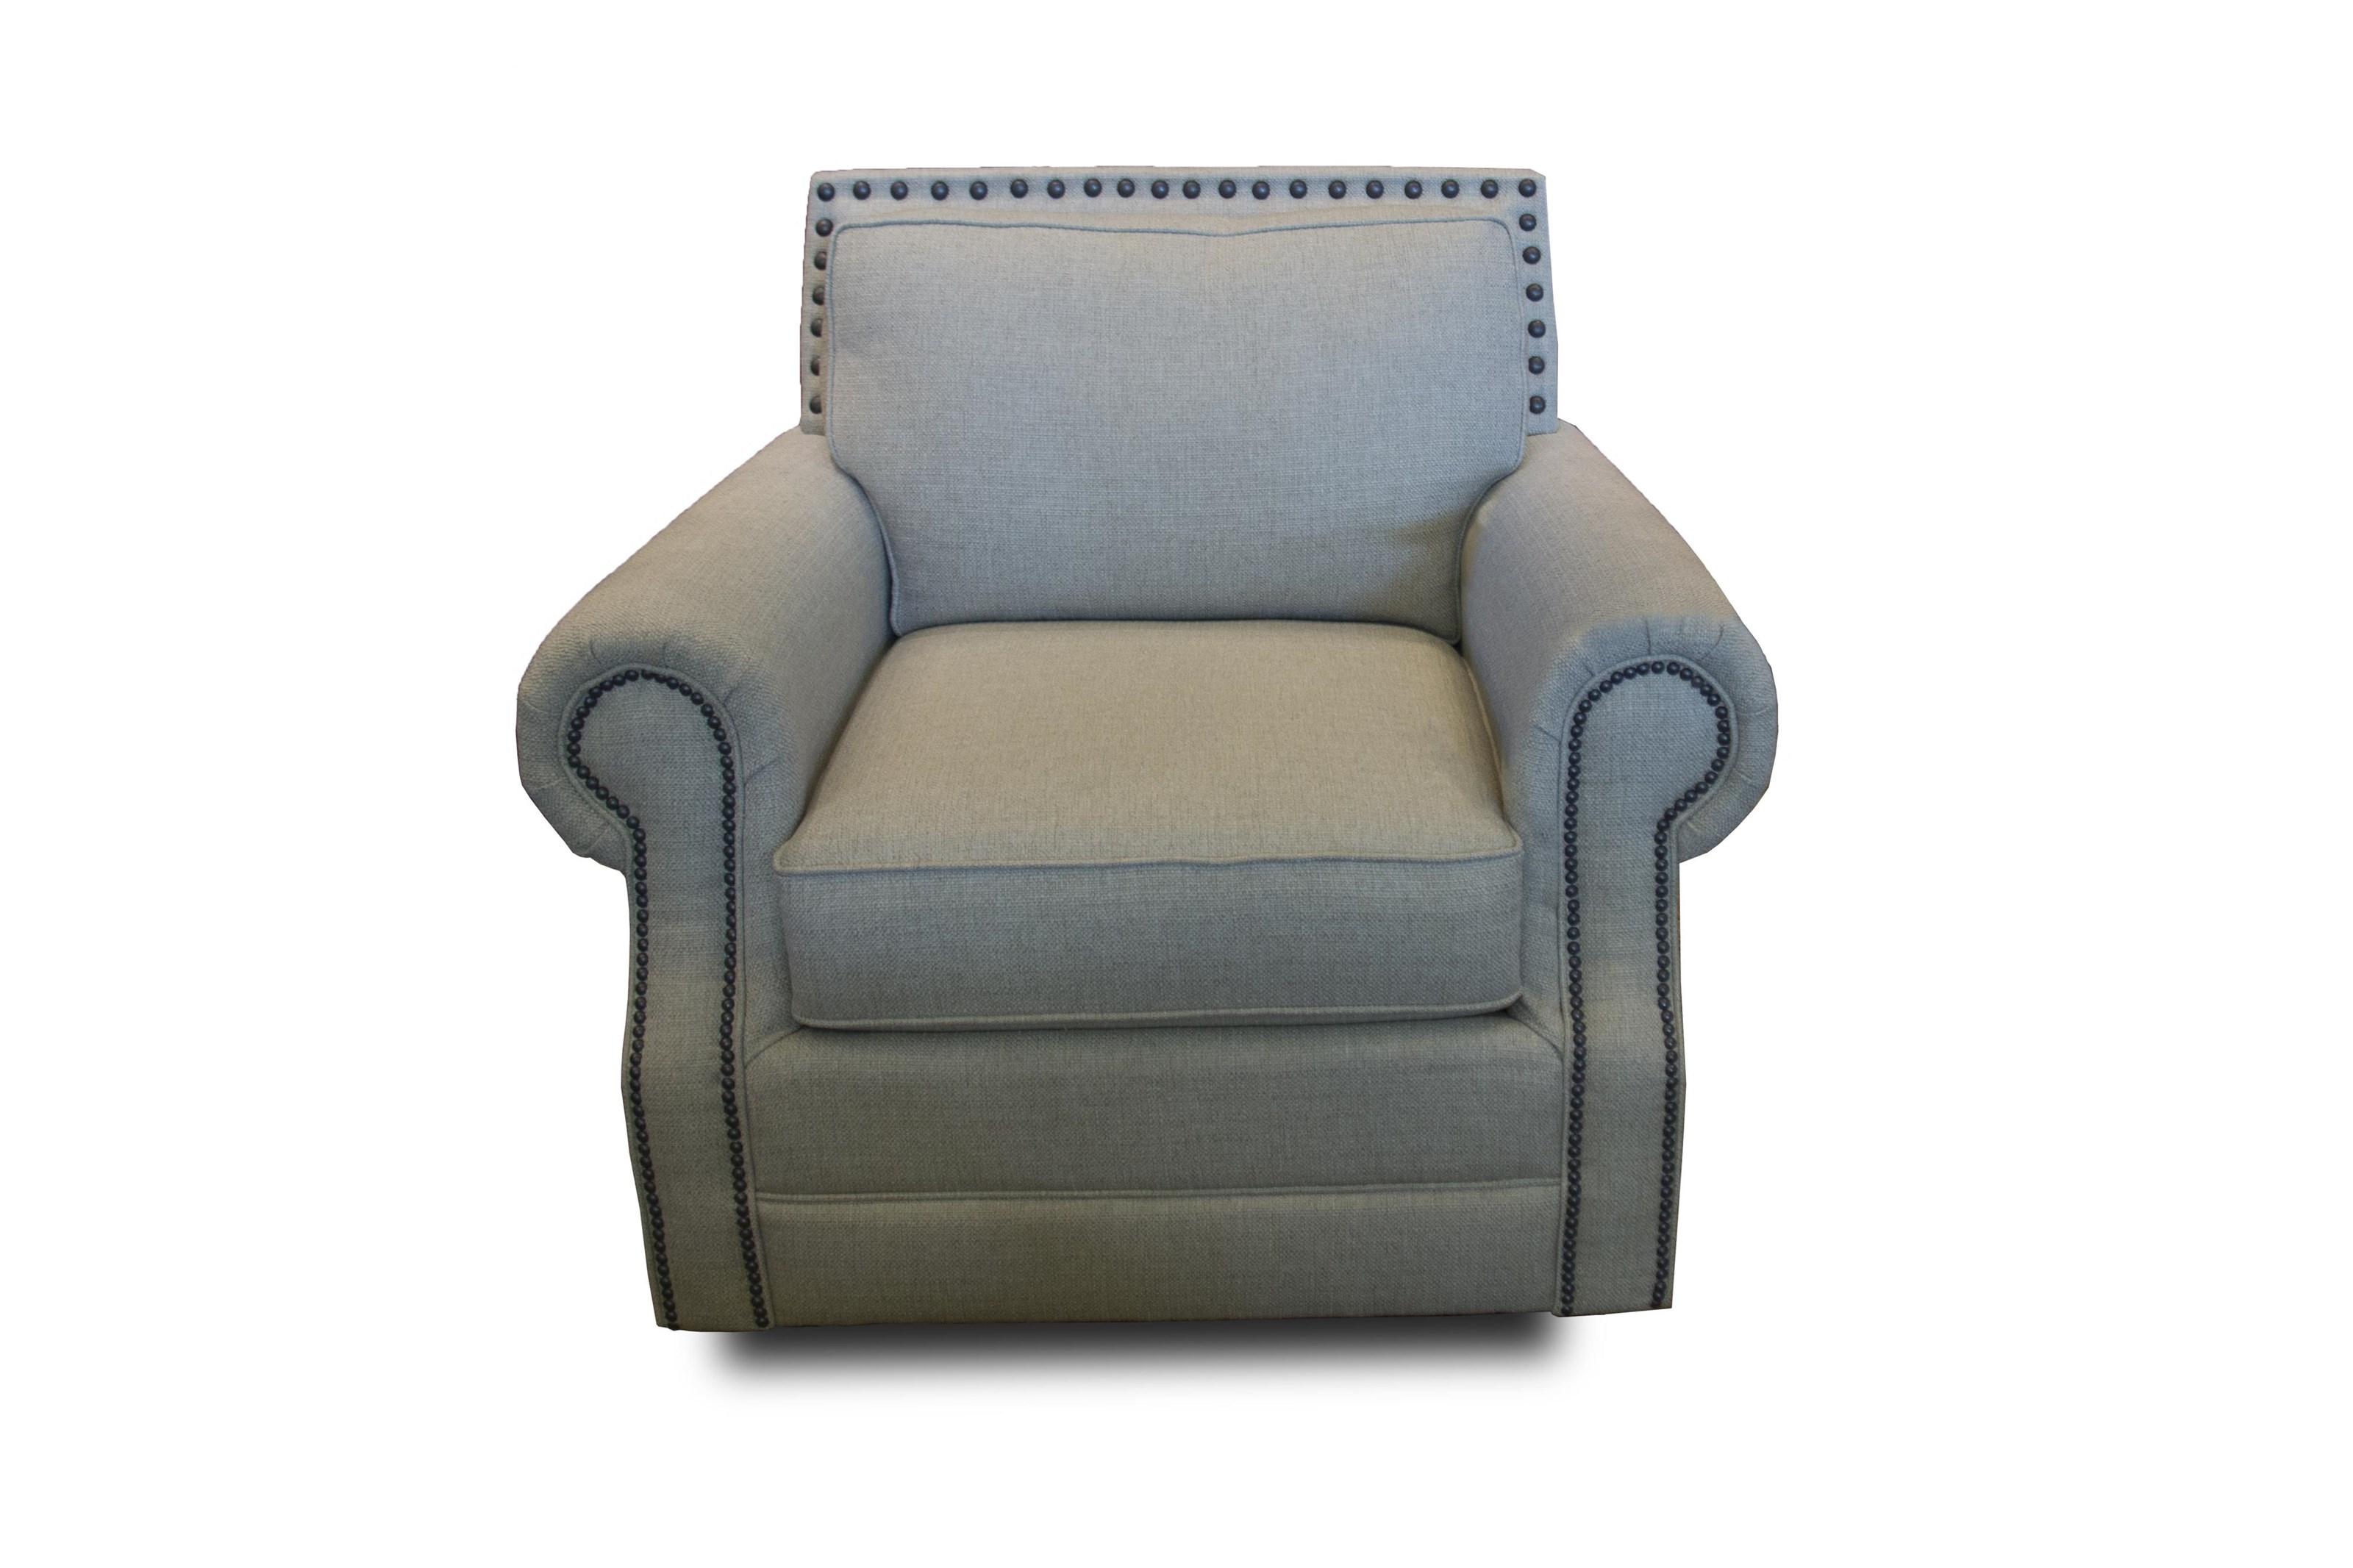 Bassett Hubbard Chair - Item Number: 3902-12H 1474-2 OBNAIL